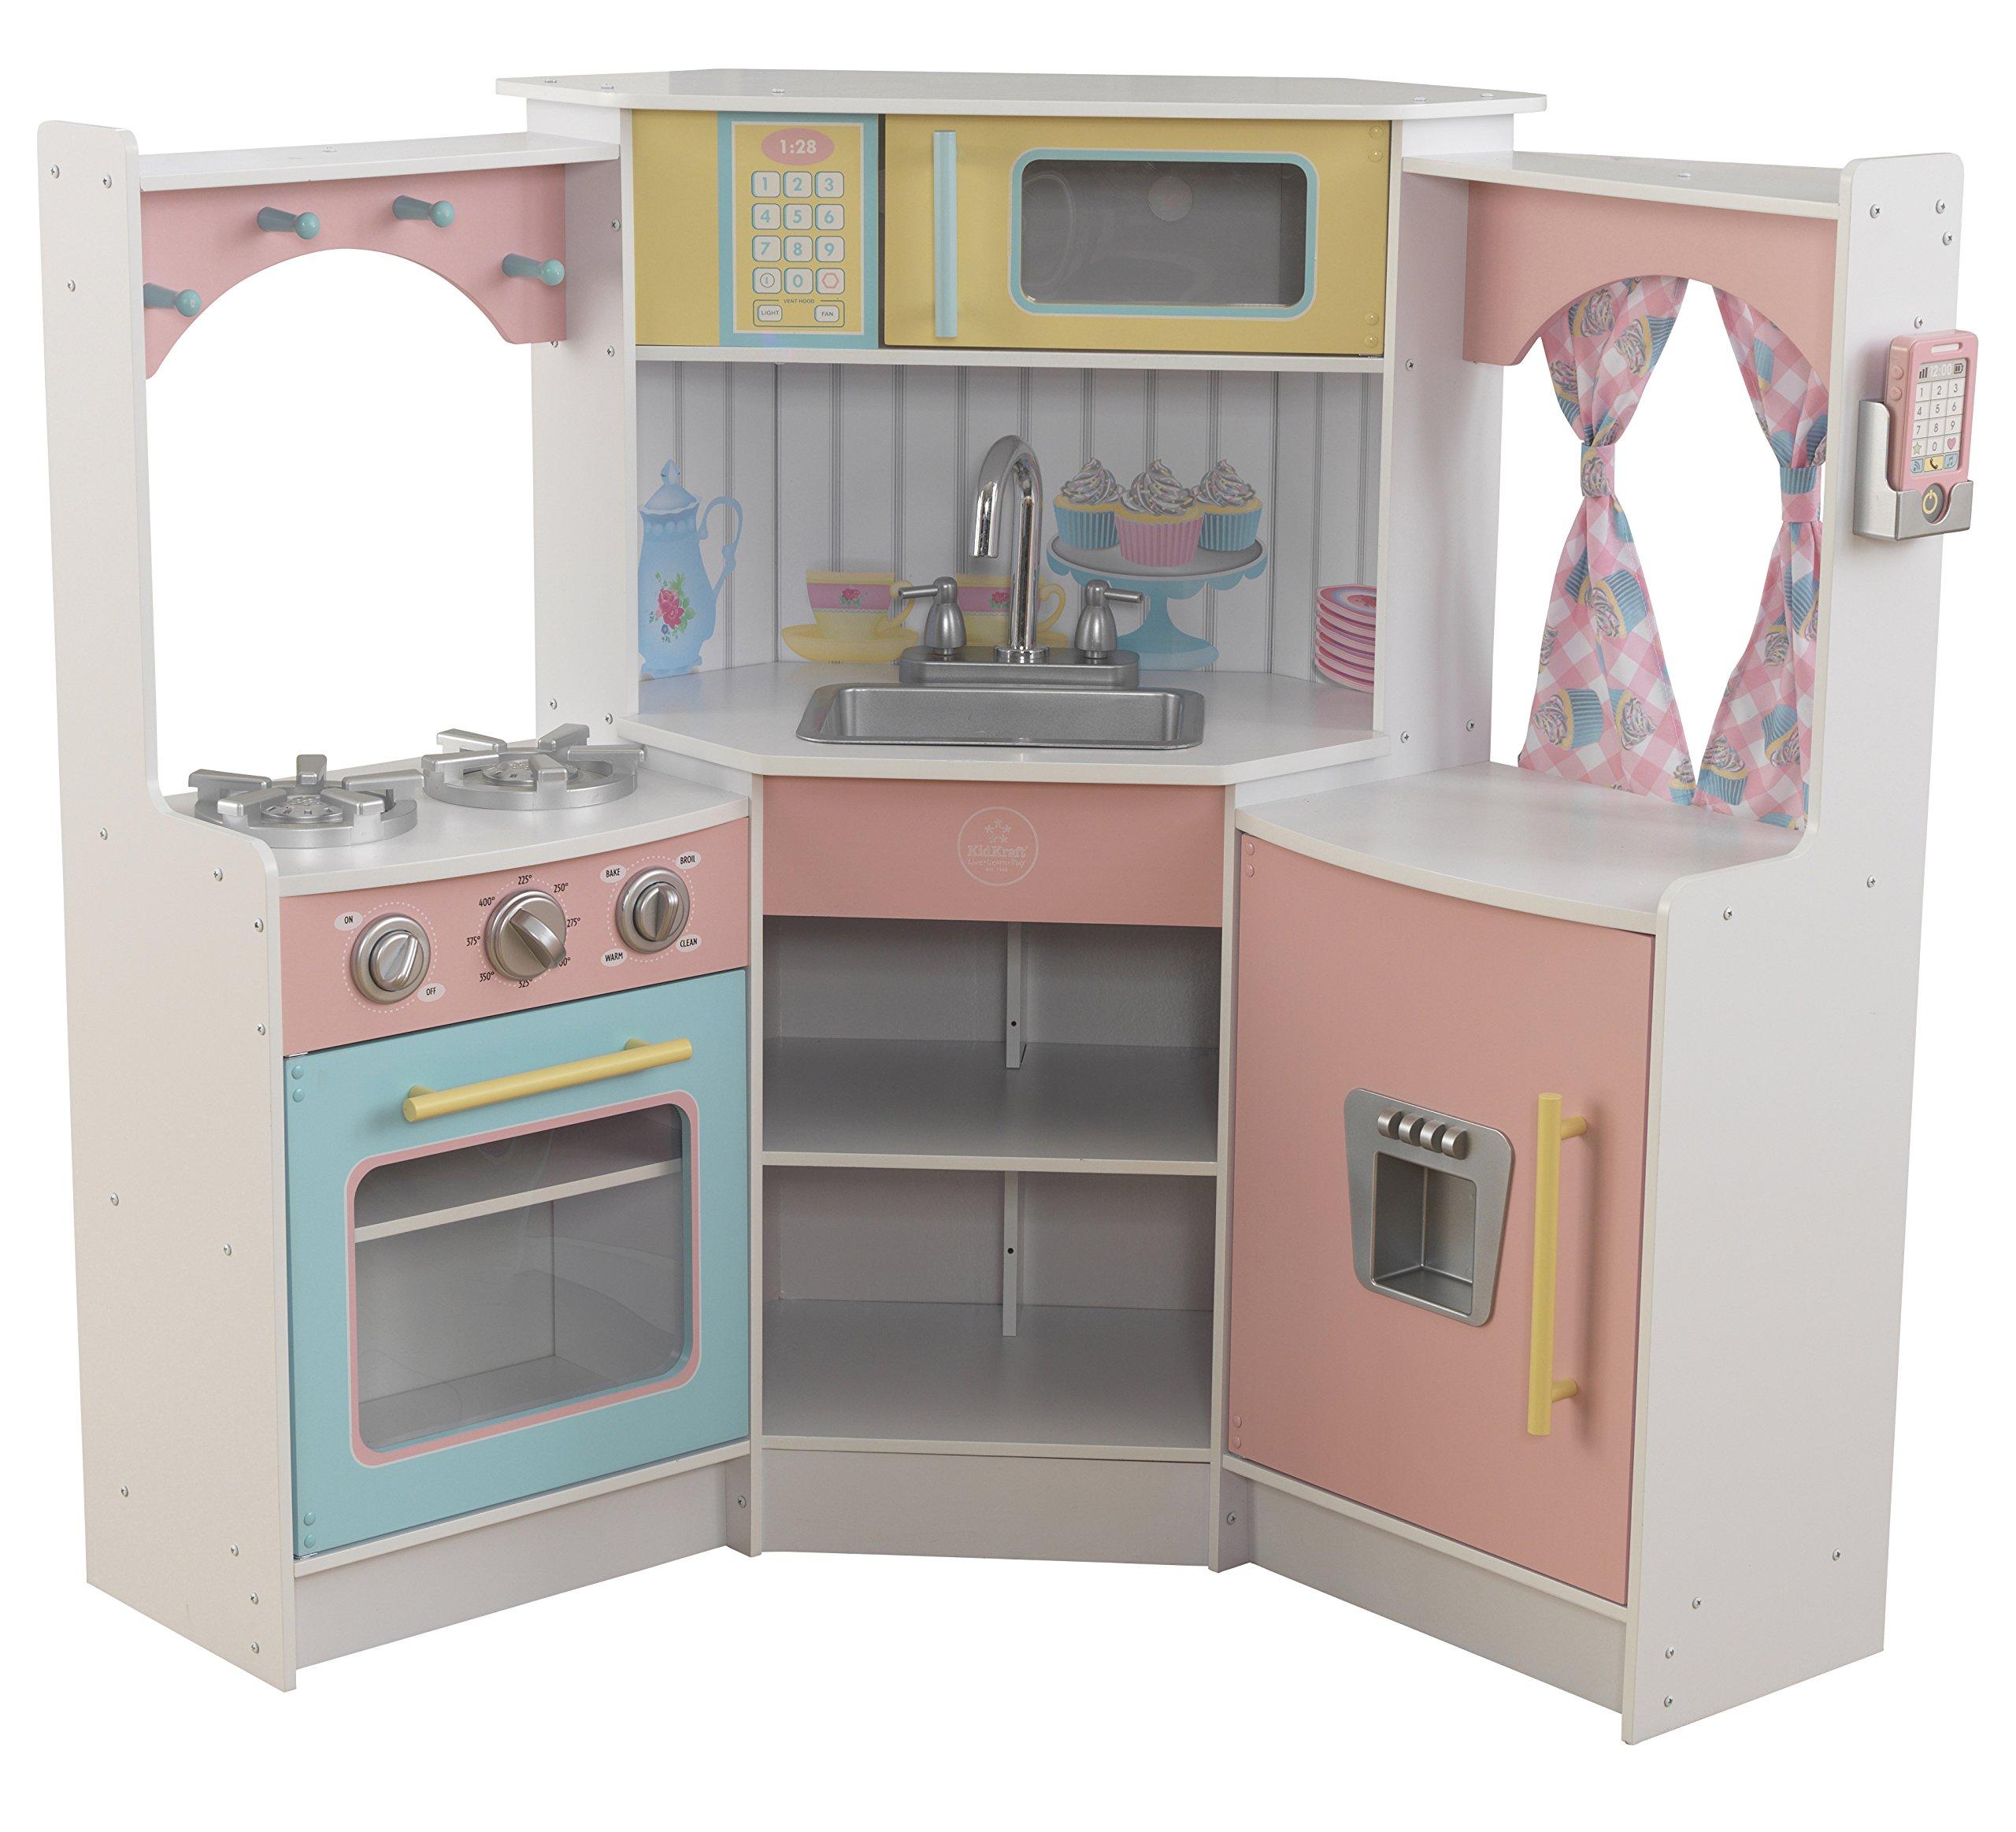 KidKraft Kids Kitchen Playset White Children As If Game New Year Gift